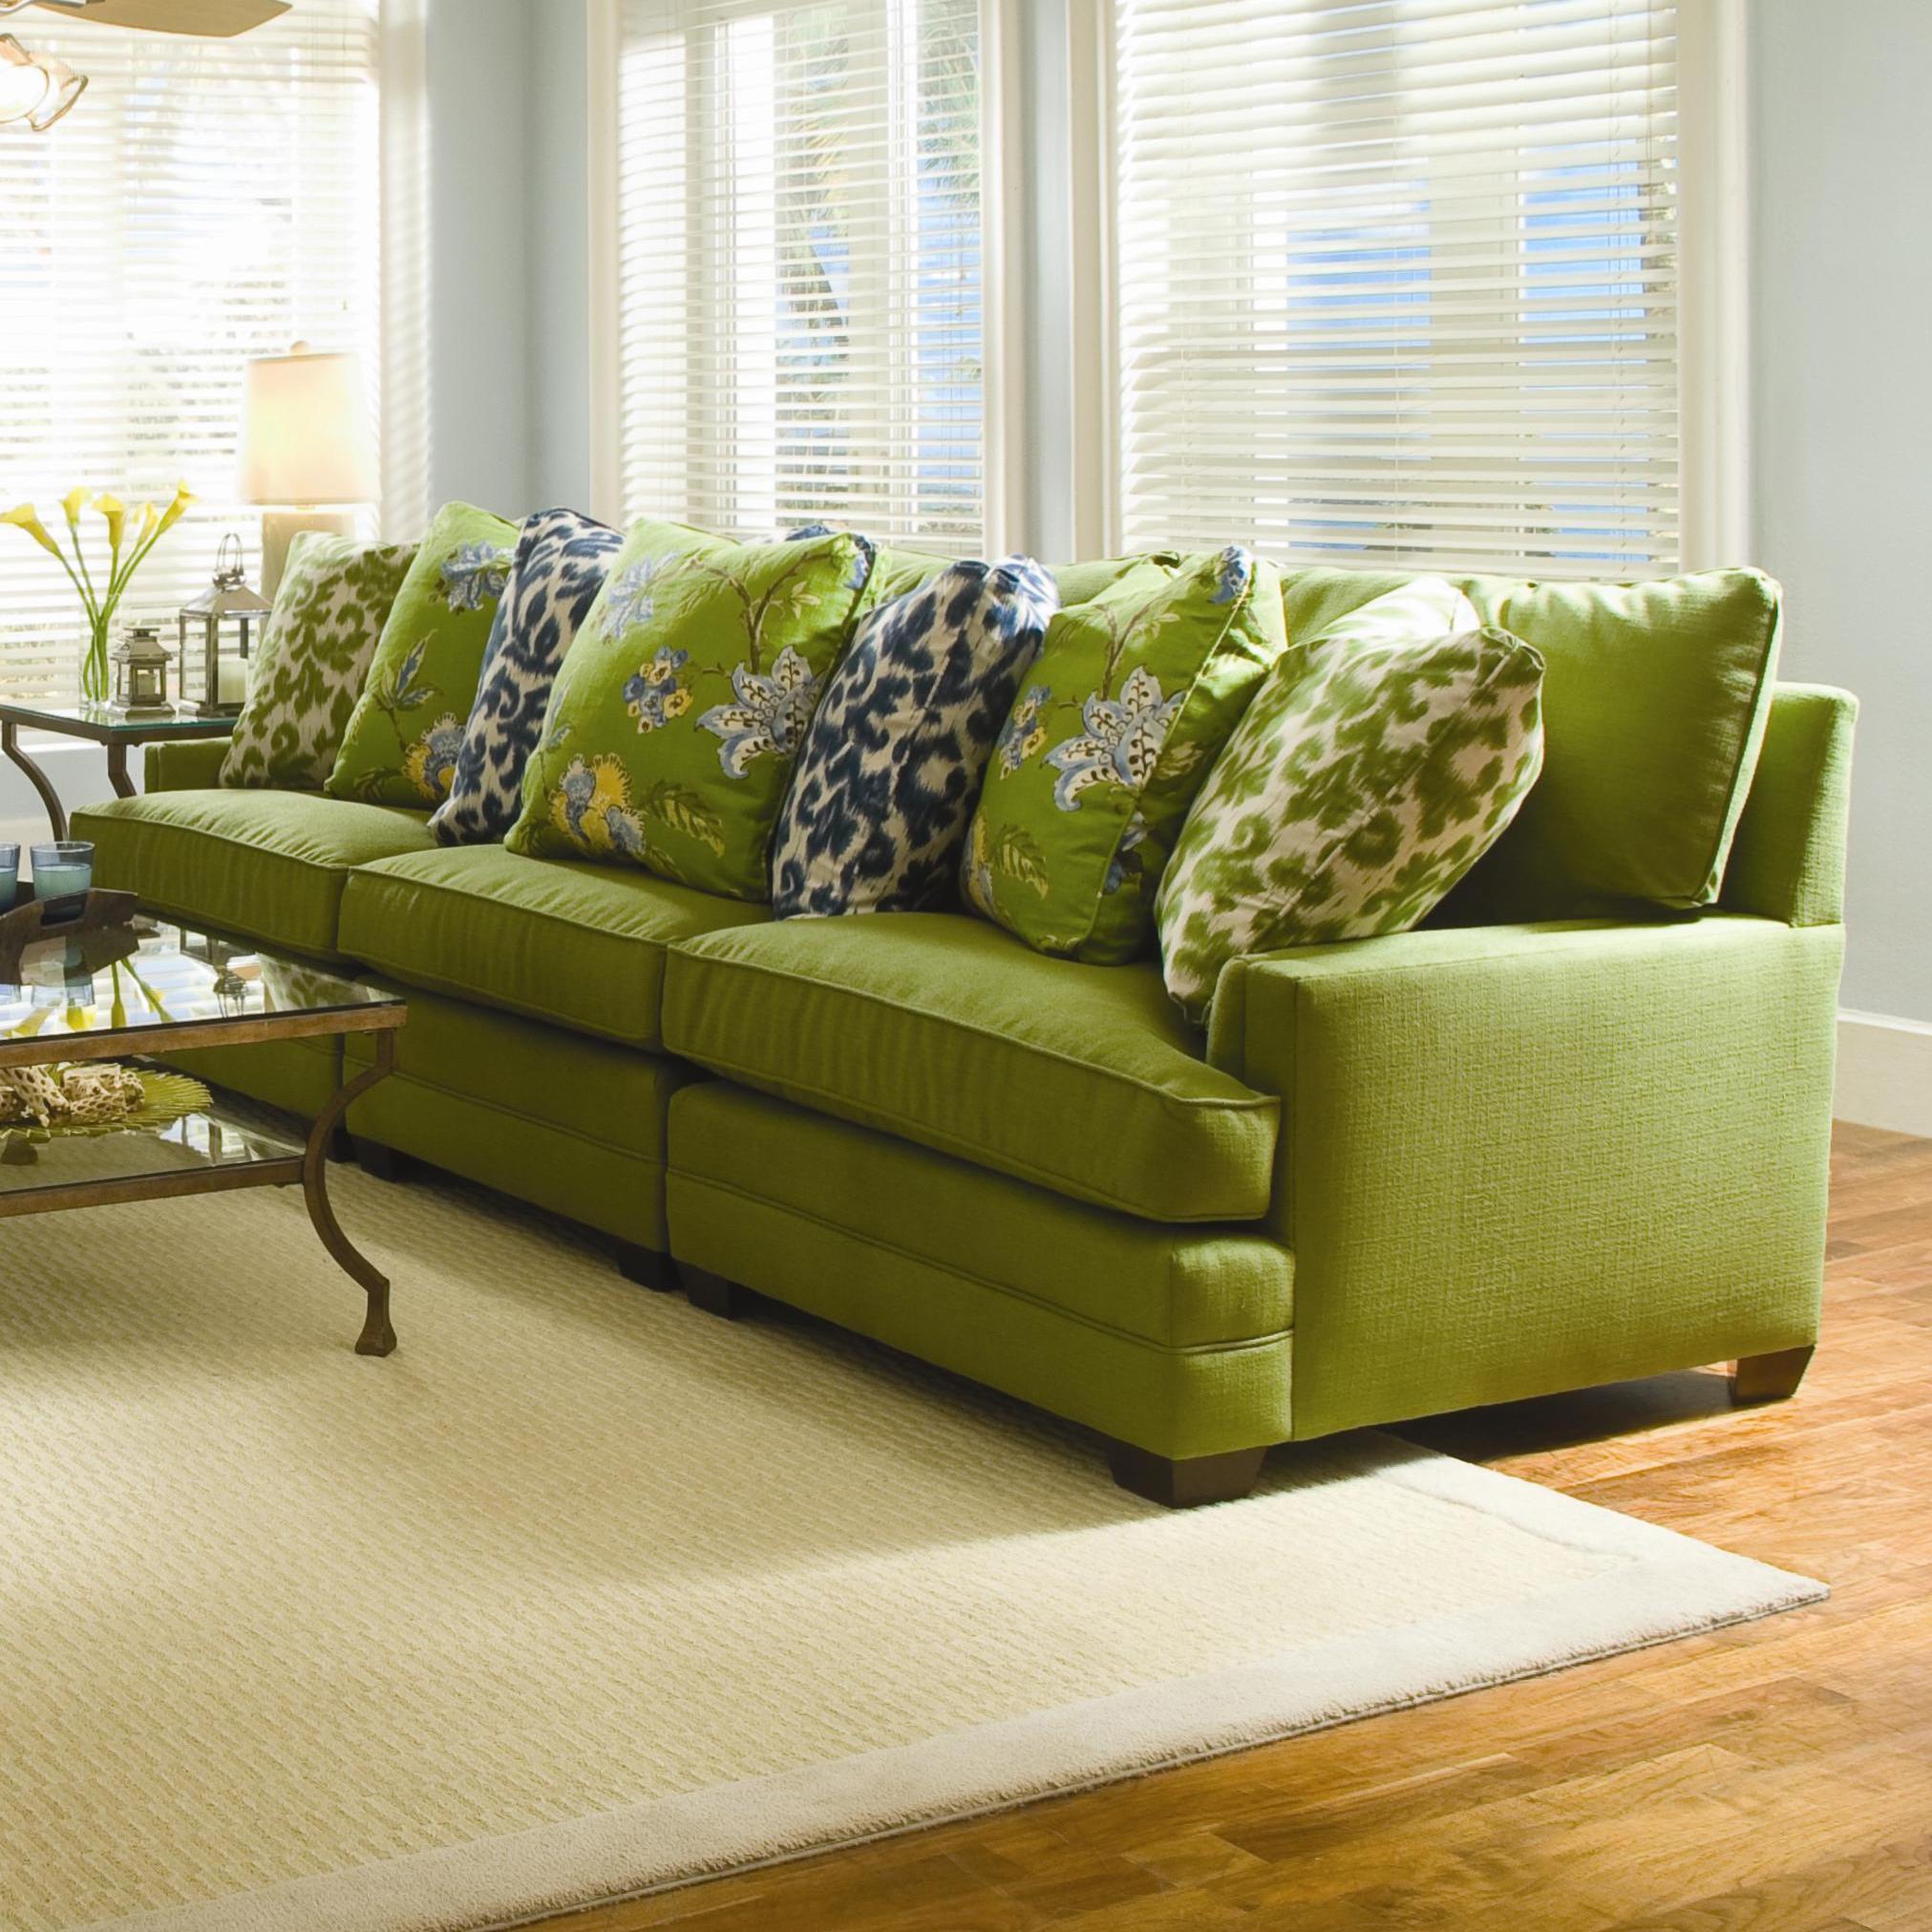 sam moore margo extra wide sectional sofa mueller. Black Bedroom Furniture Sets. Home Design Ideas